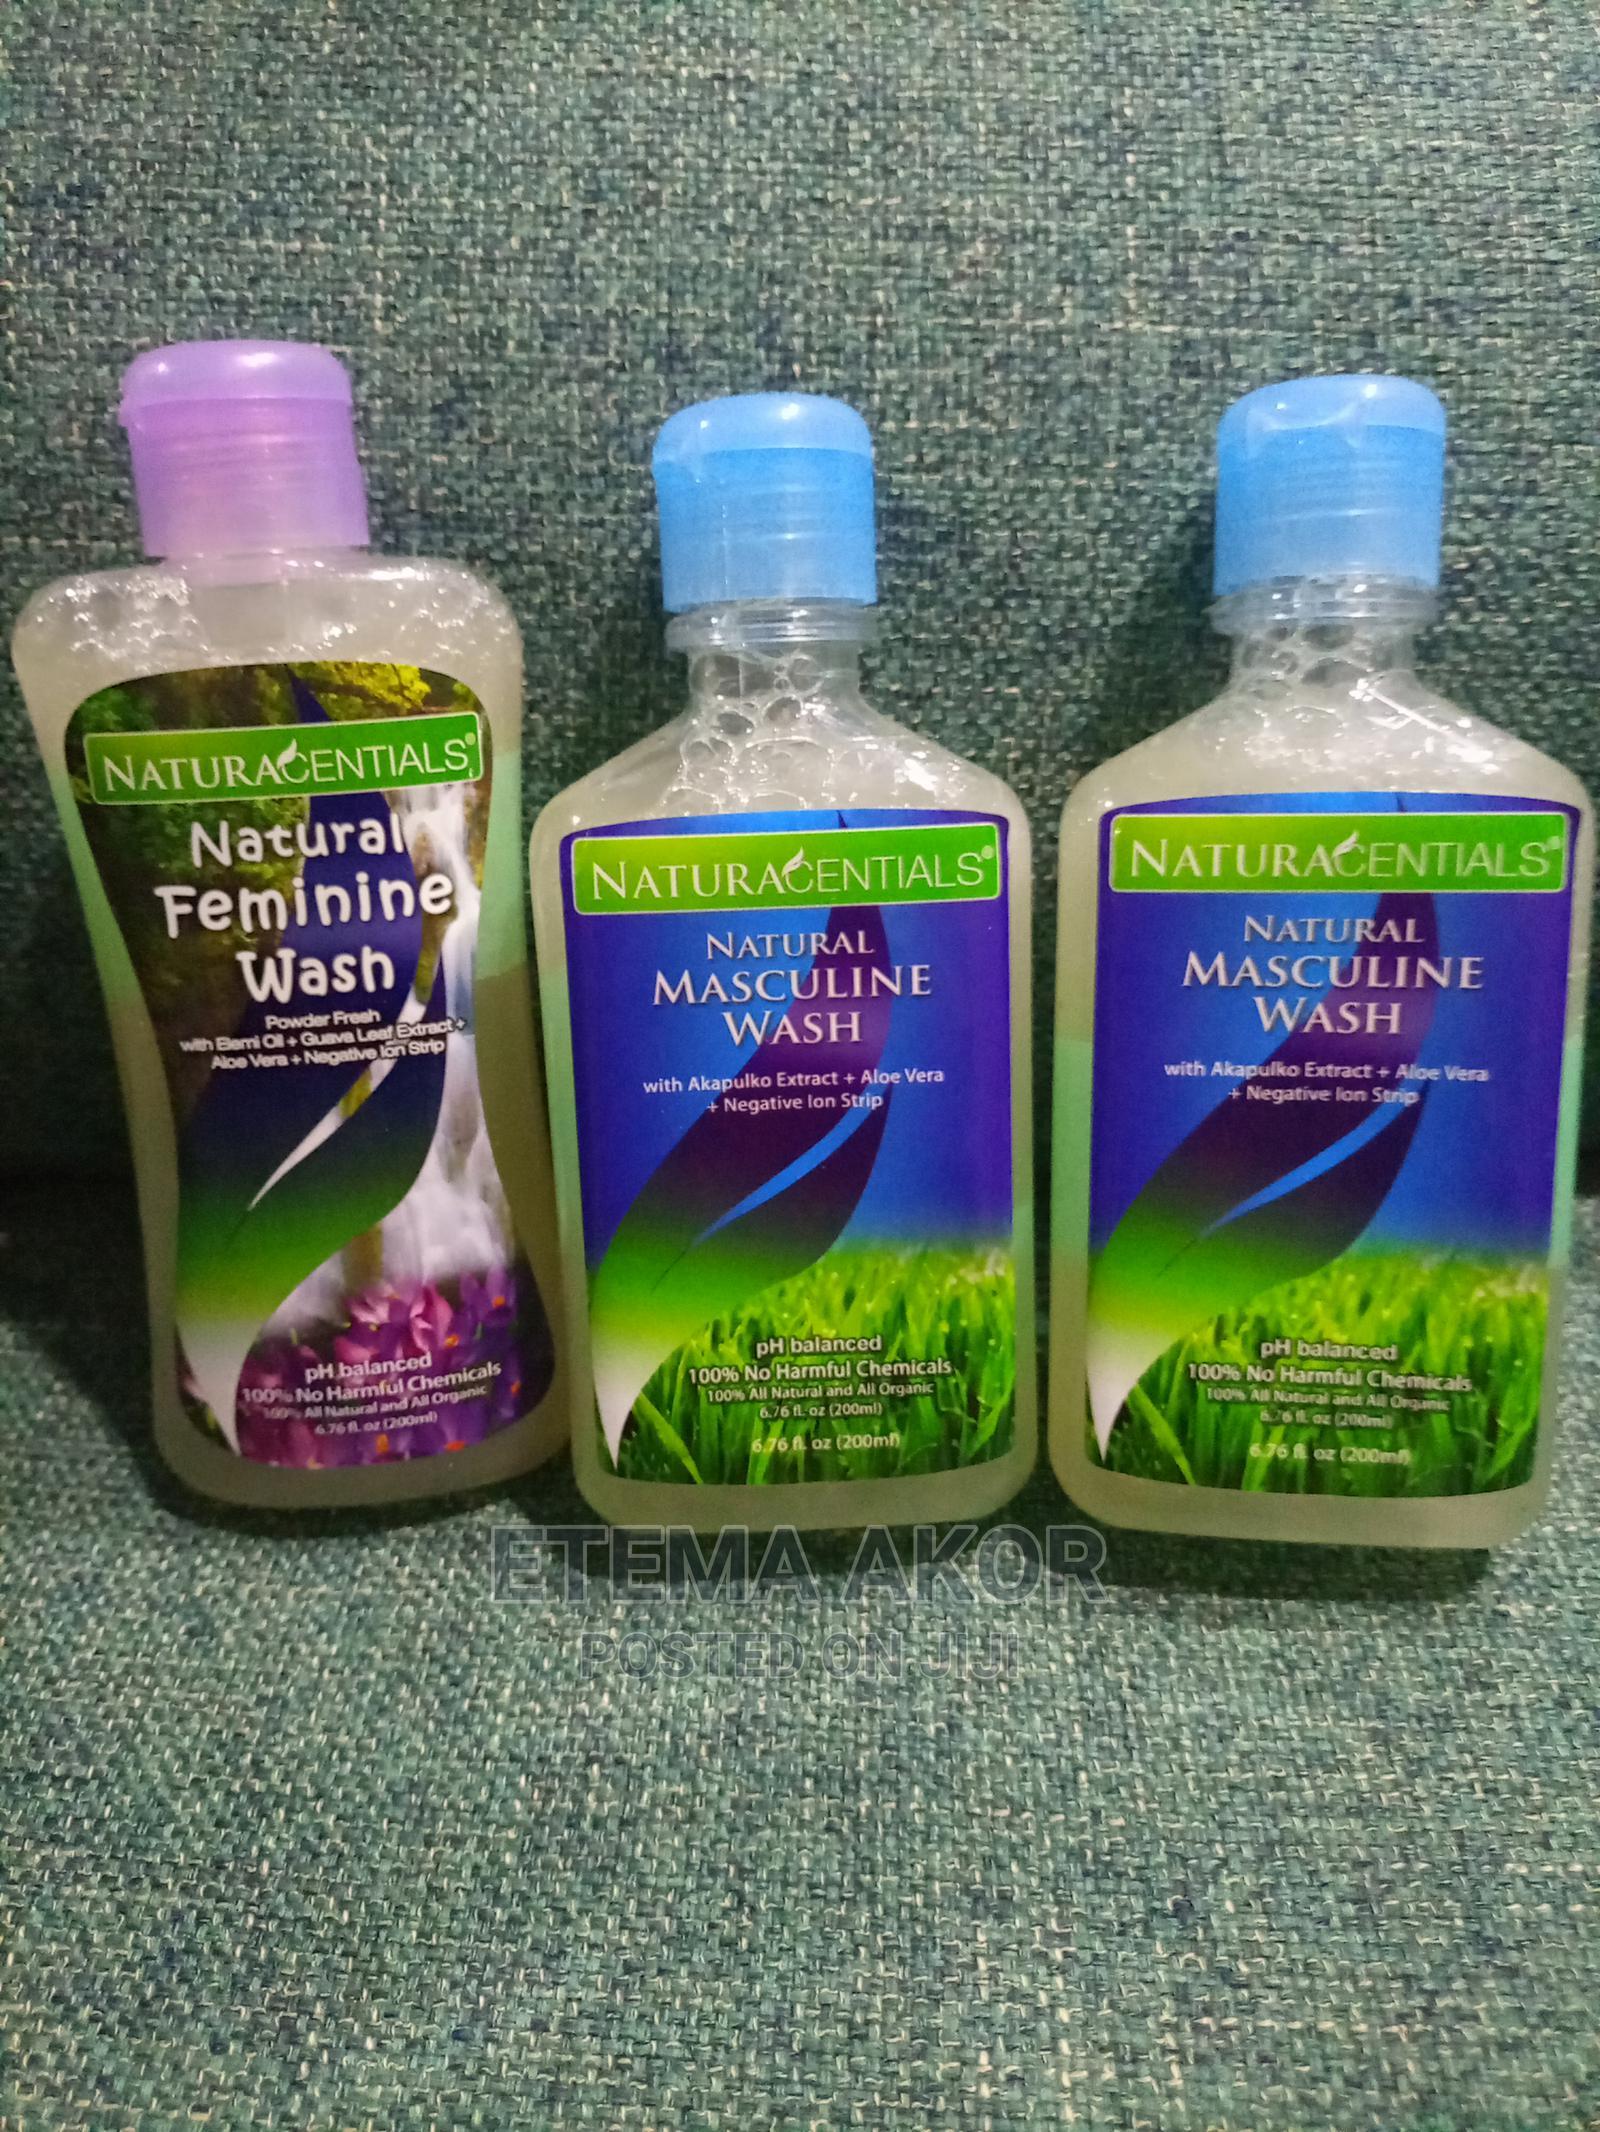 2 Natural Masculine Wash